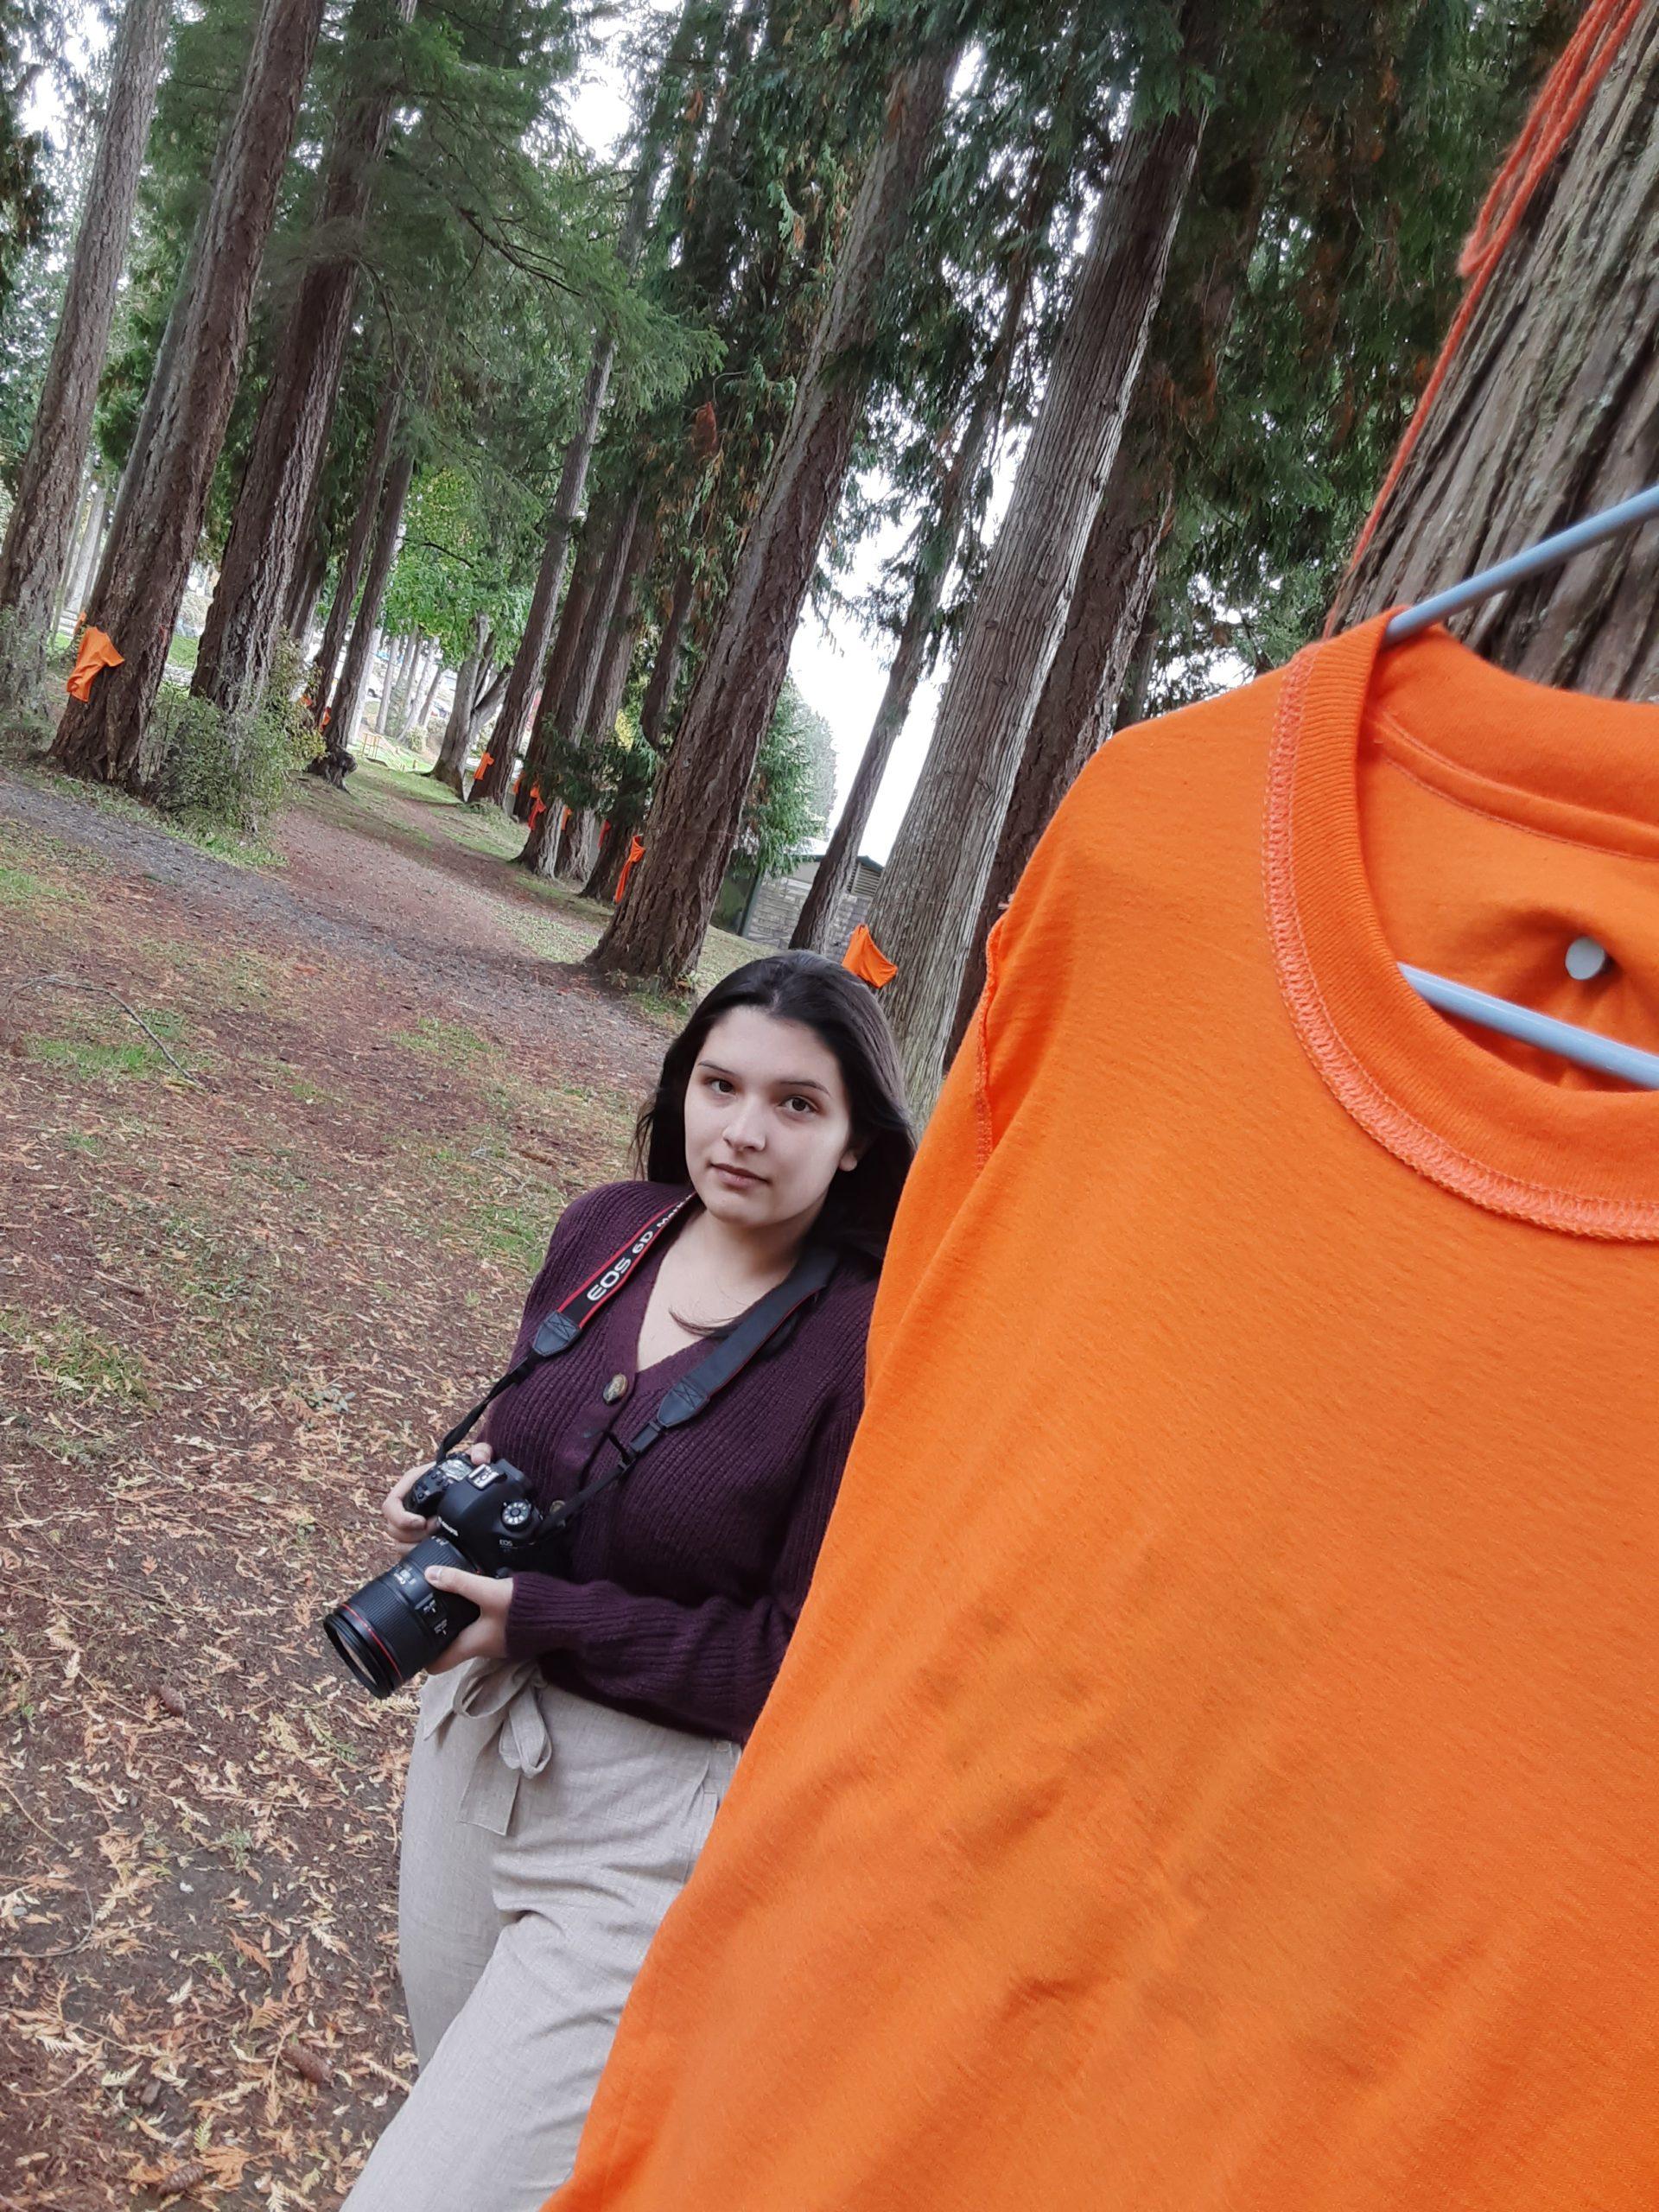 Reporter Abby Francis by Pieta Woolley, qathet Living